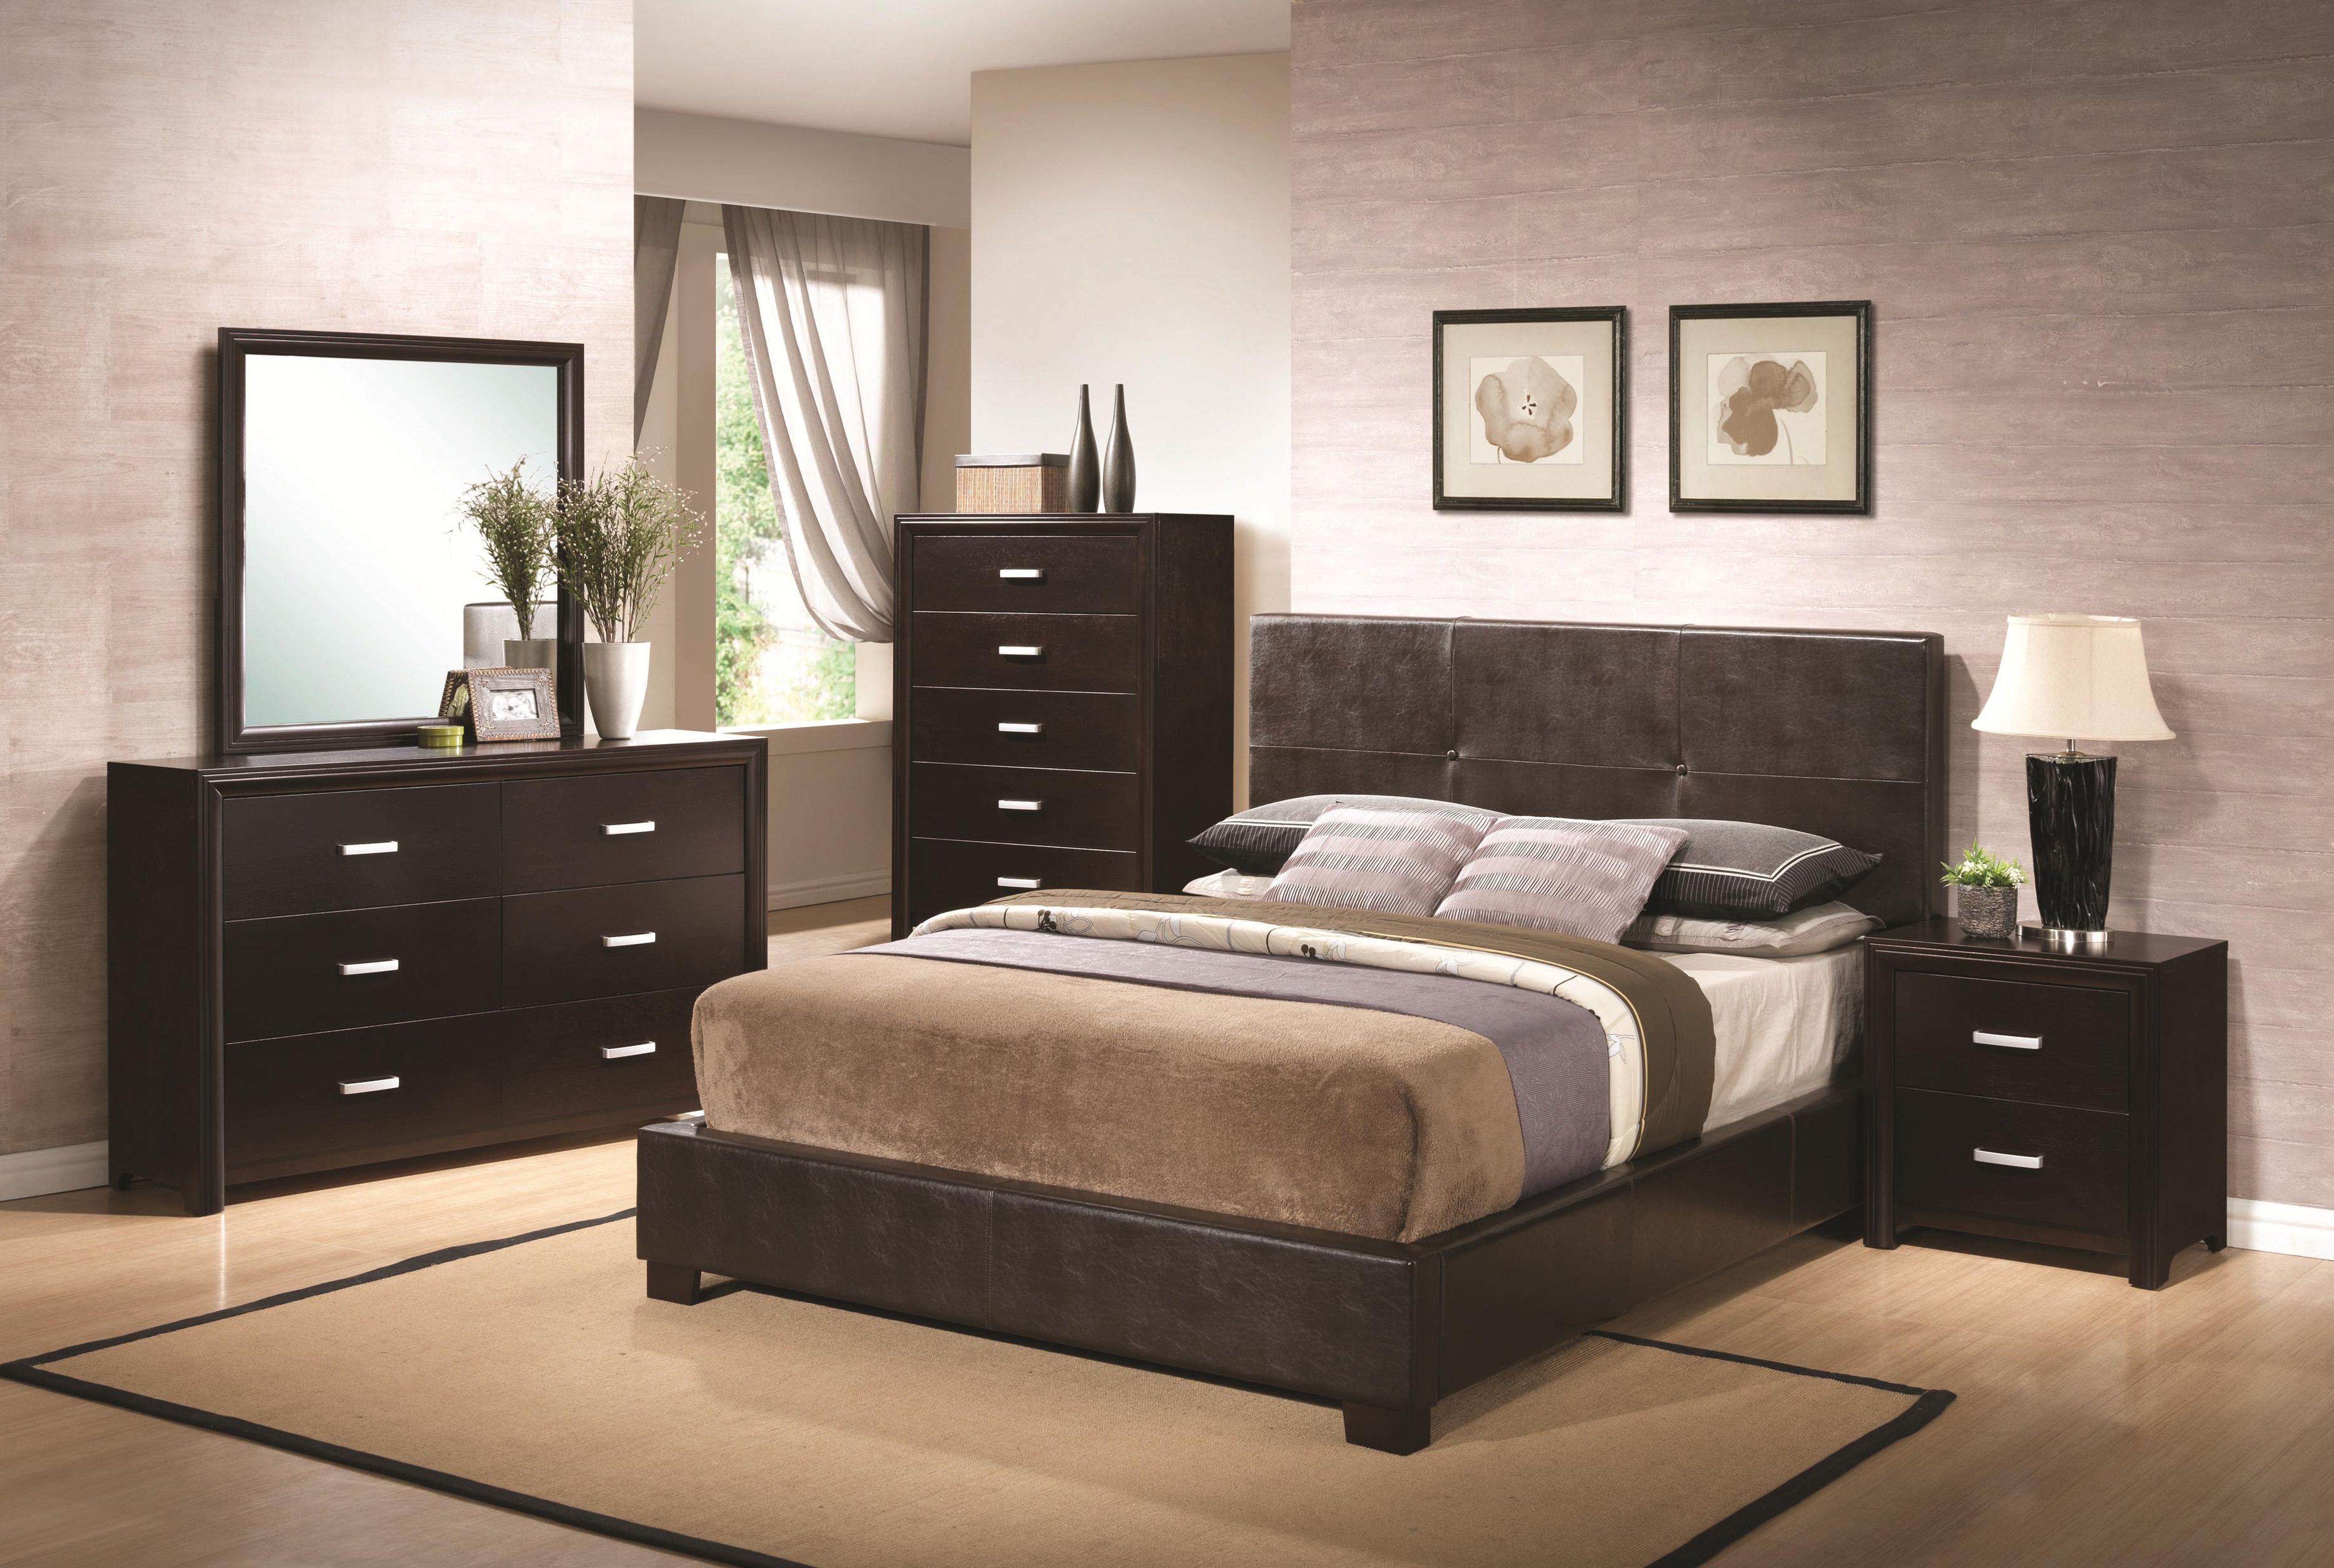 bedroom furniture sets ikea photo - 1